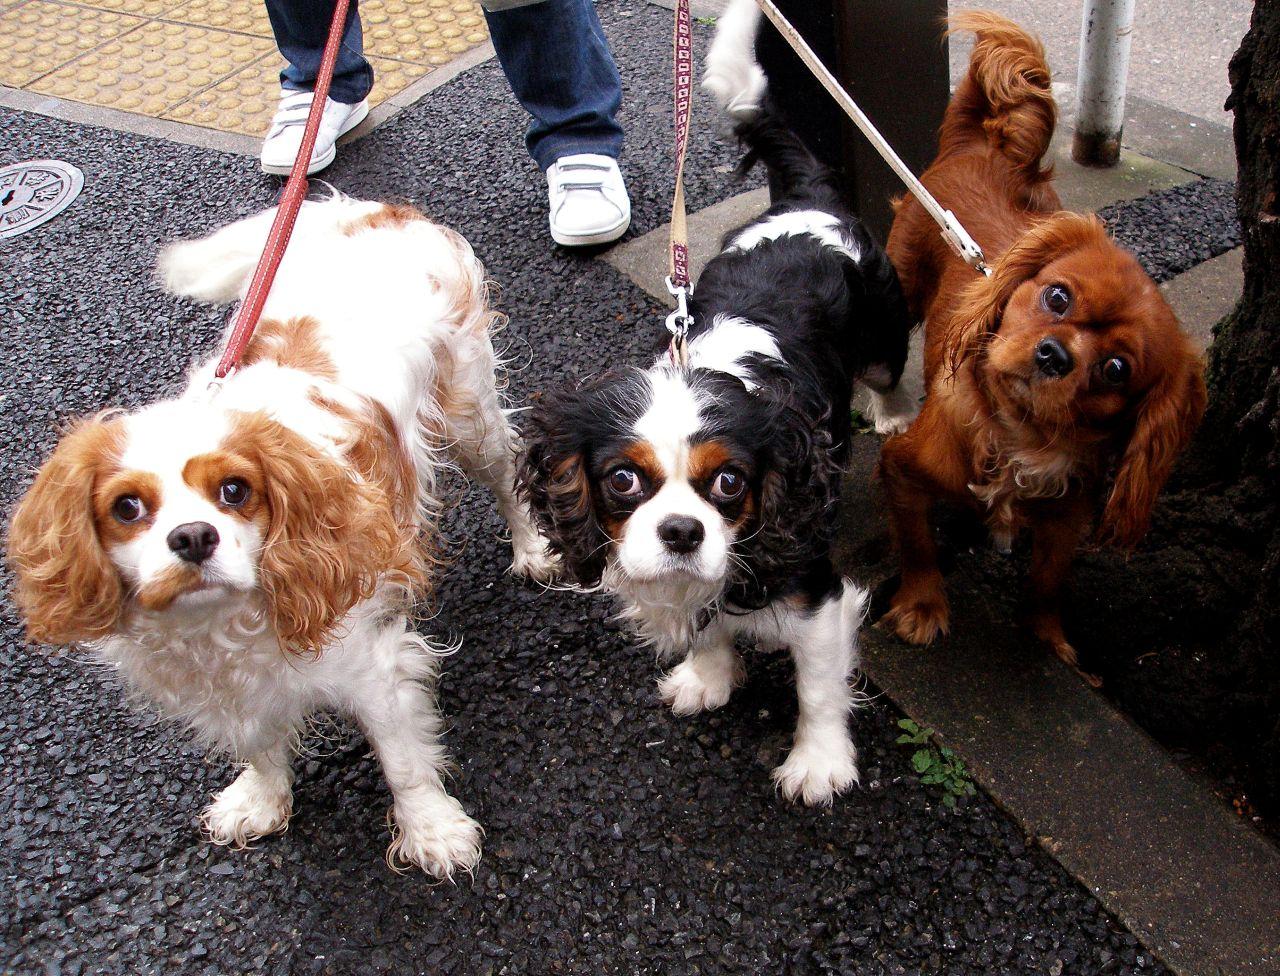 Three King Charles Spaniel dogs wallpaper